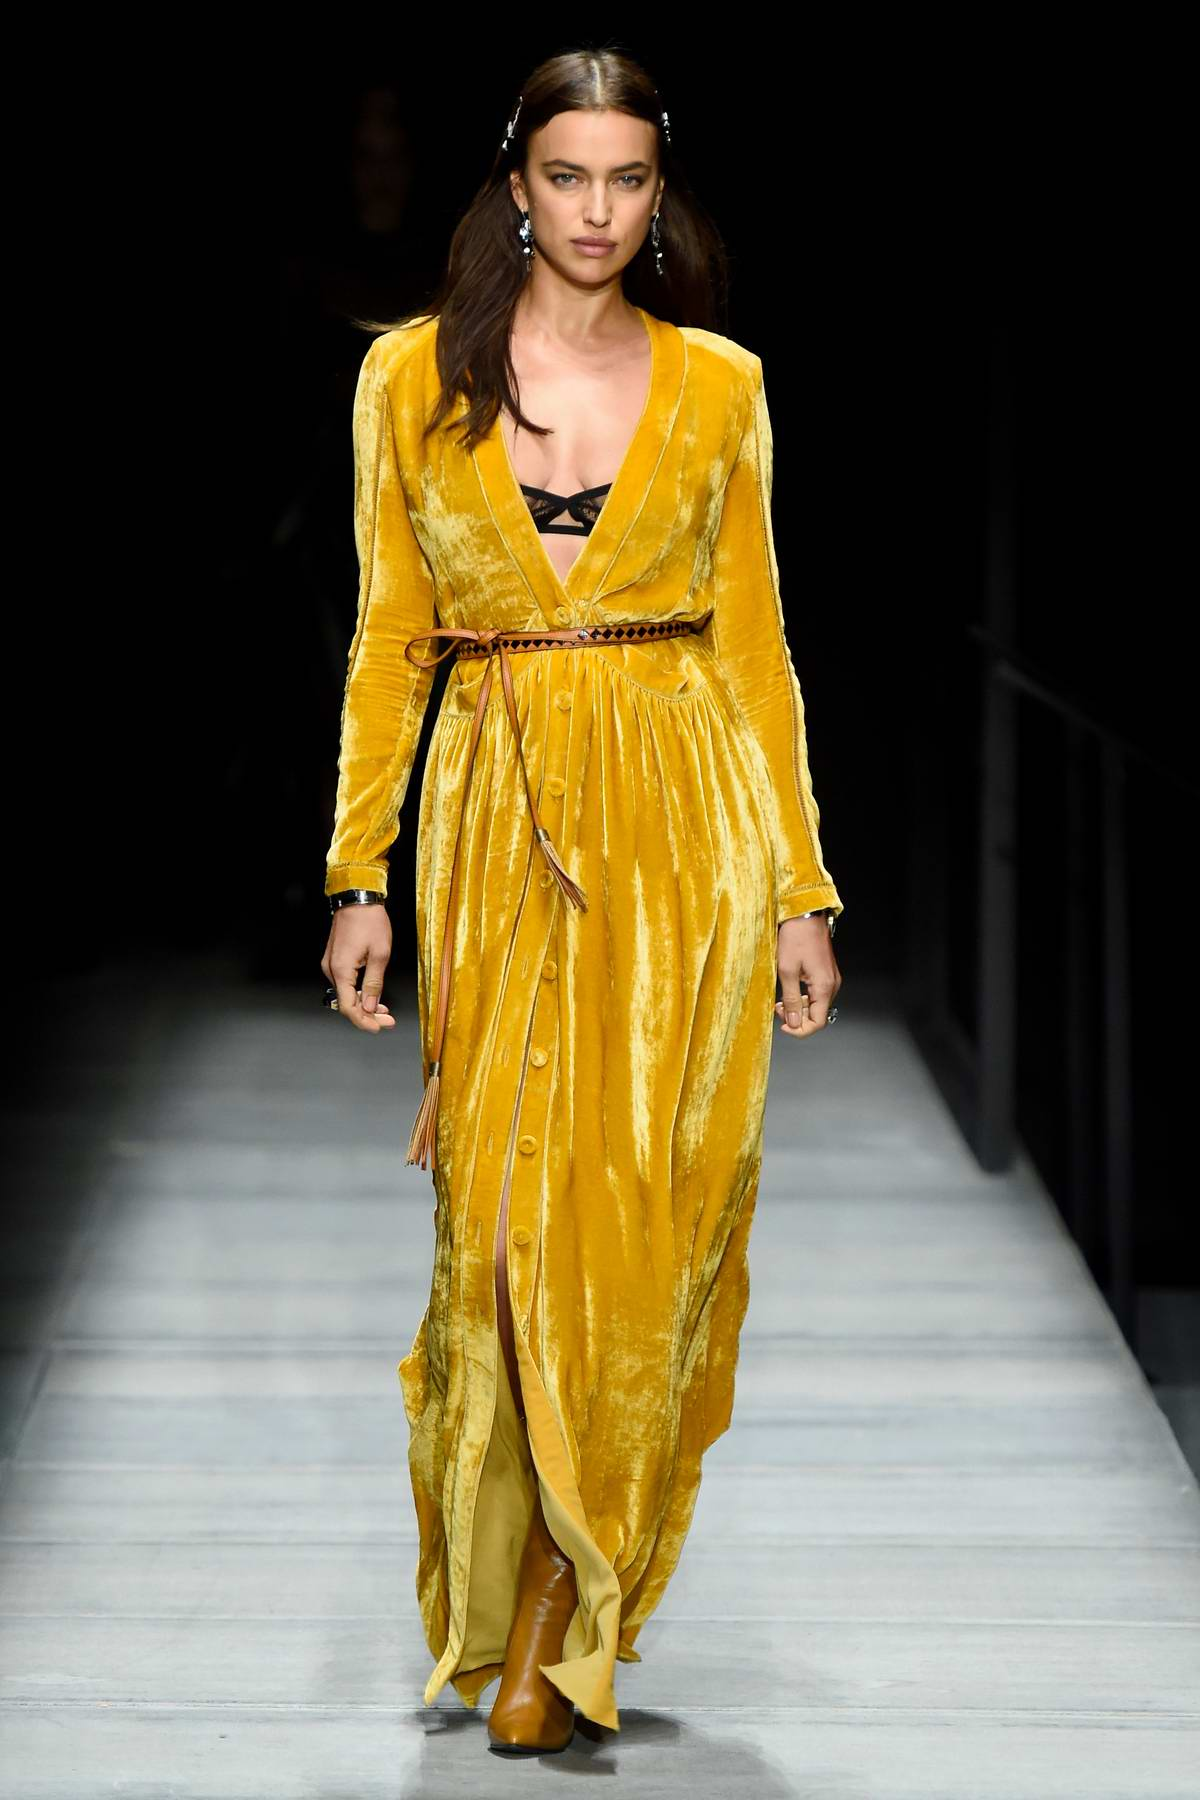 Irina Shayk attends Bottega Veneta Fashion Show during New York Fashion Week in New York City